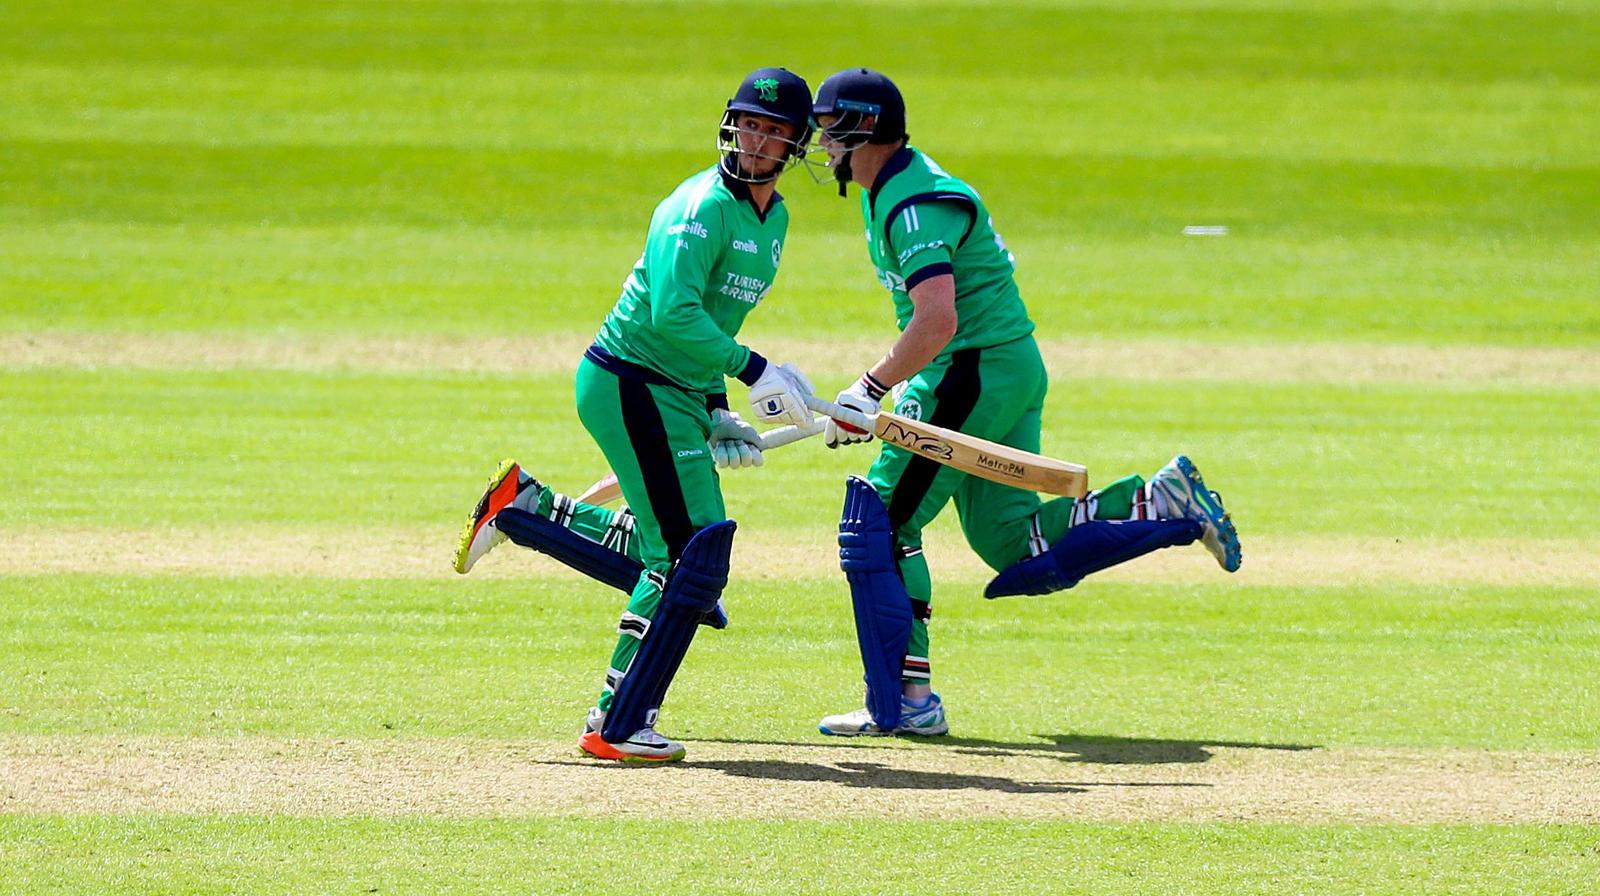 Windies beat Ireland with record run chase in Malahide - RTE